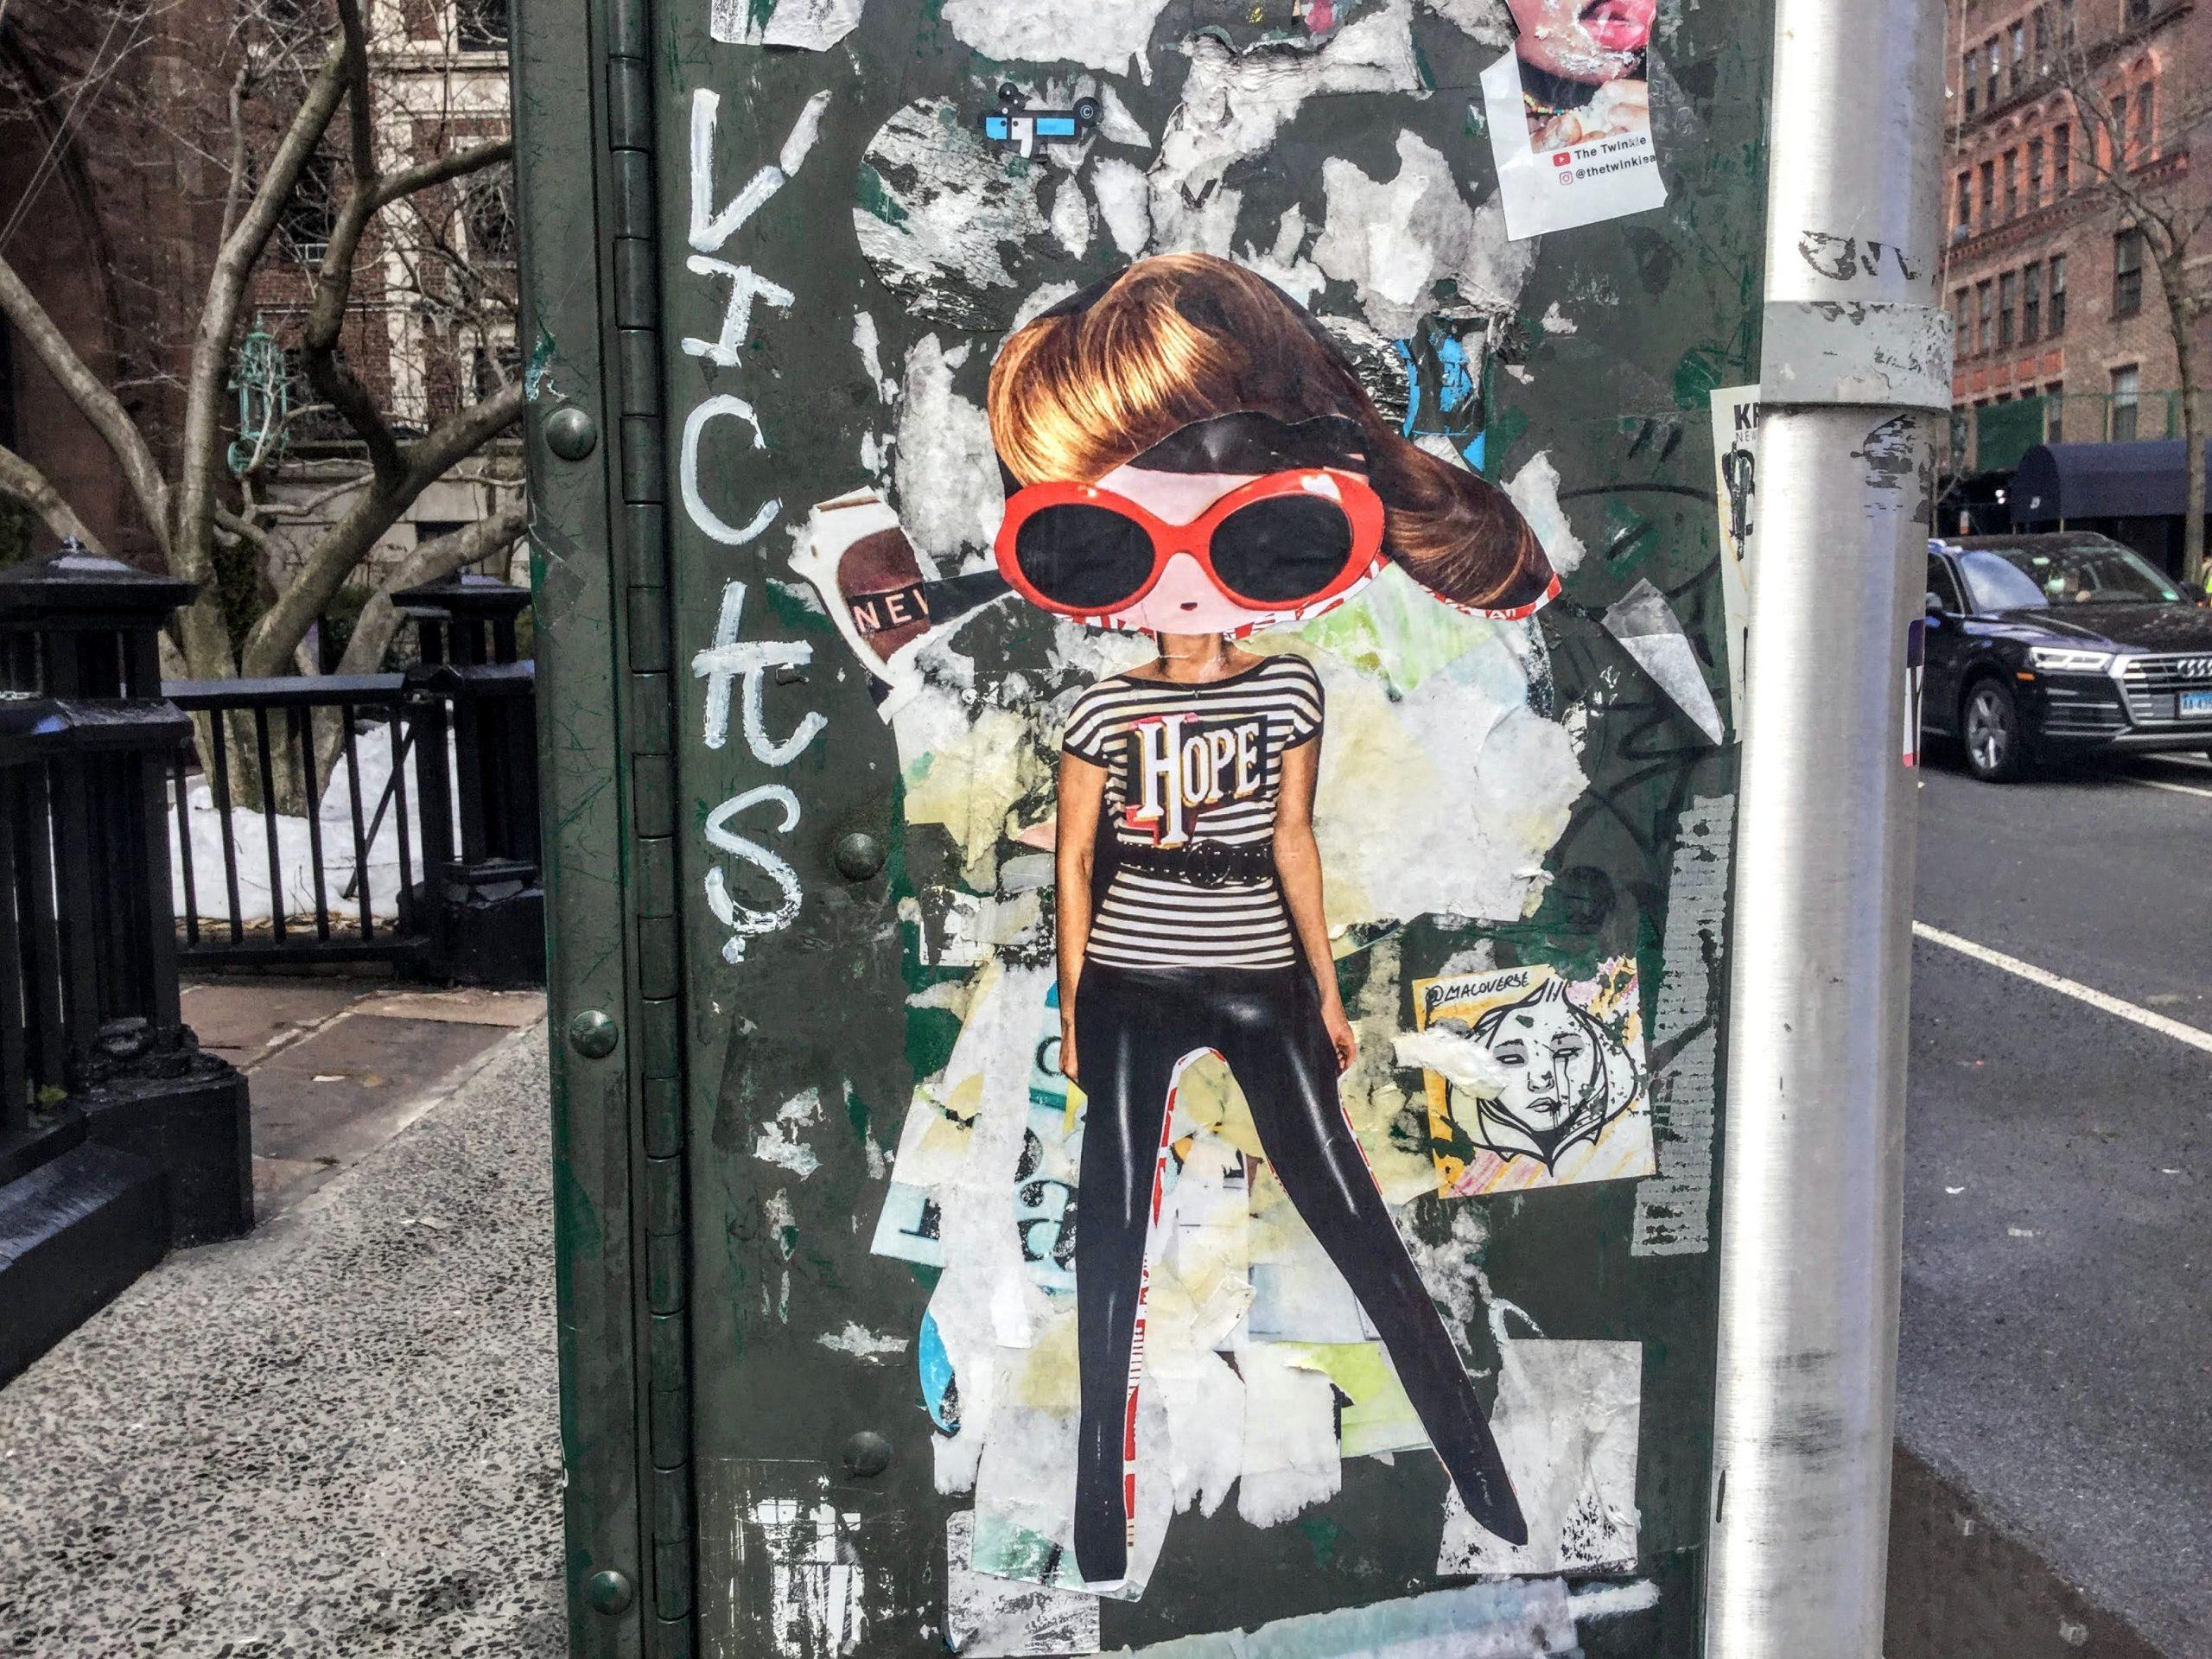 Phoebe street art